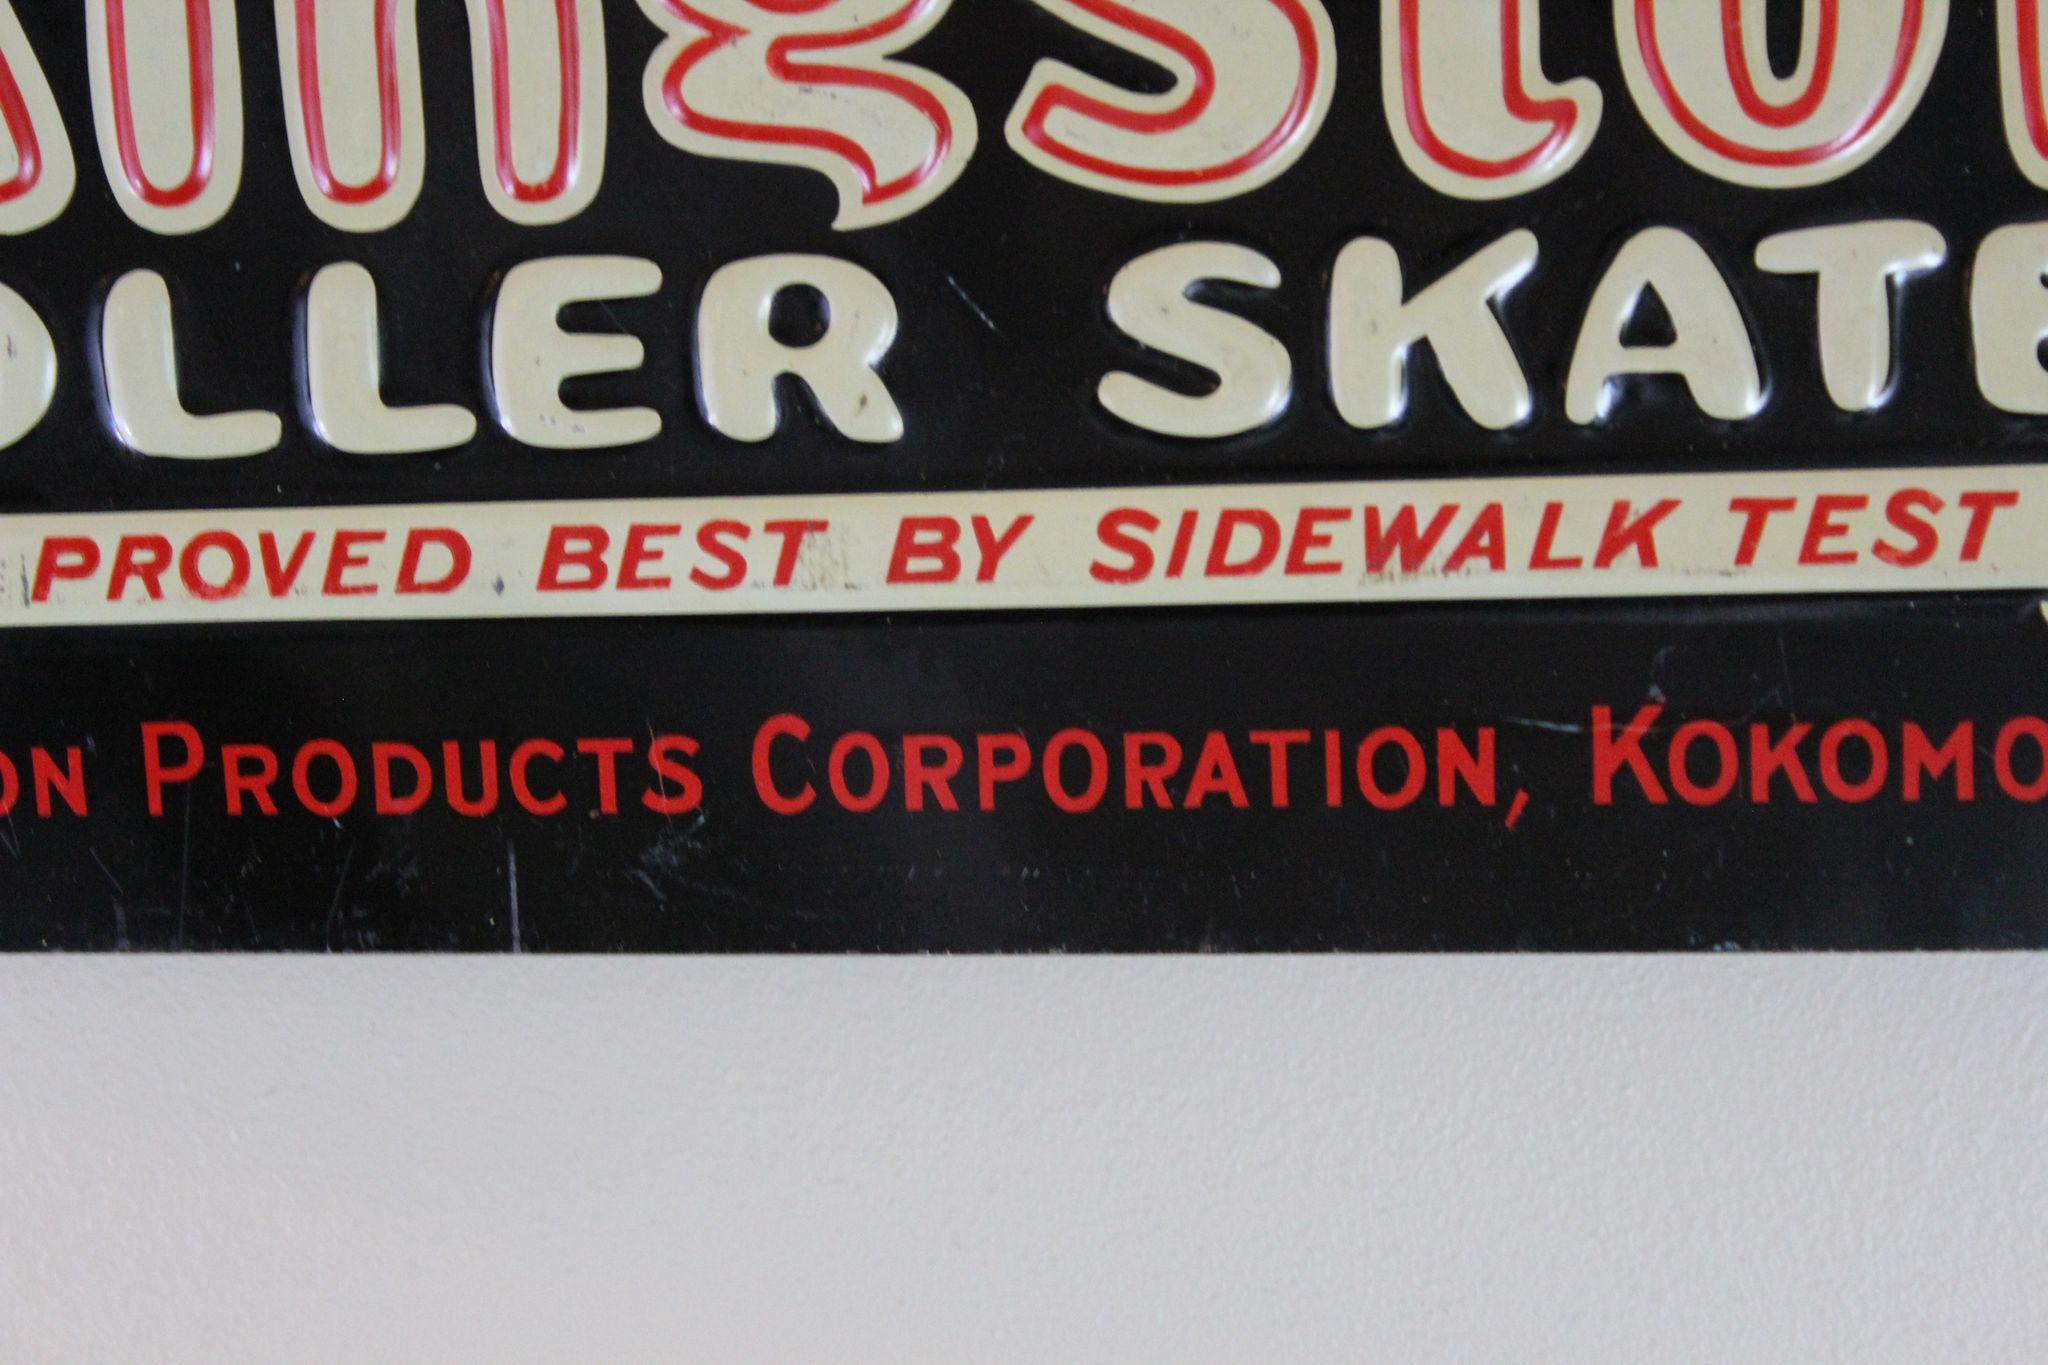 Roller skates kingston - Roll Over Large Image To Magnify Click Large Image To Zoom Change Background Expand Description Embossed Kingston Roller Skates